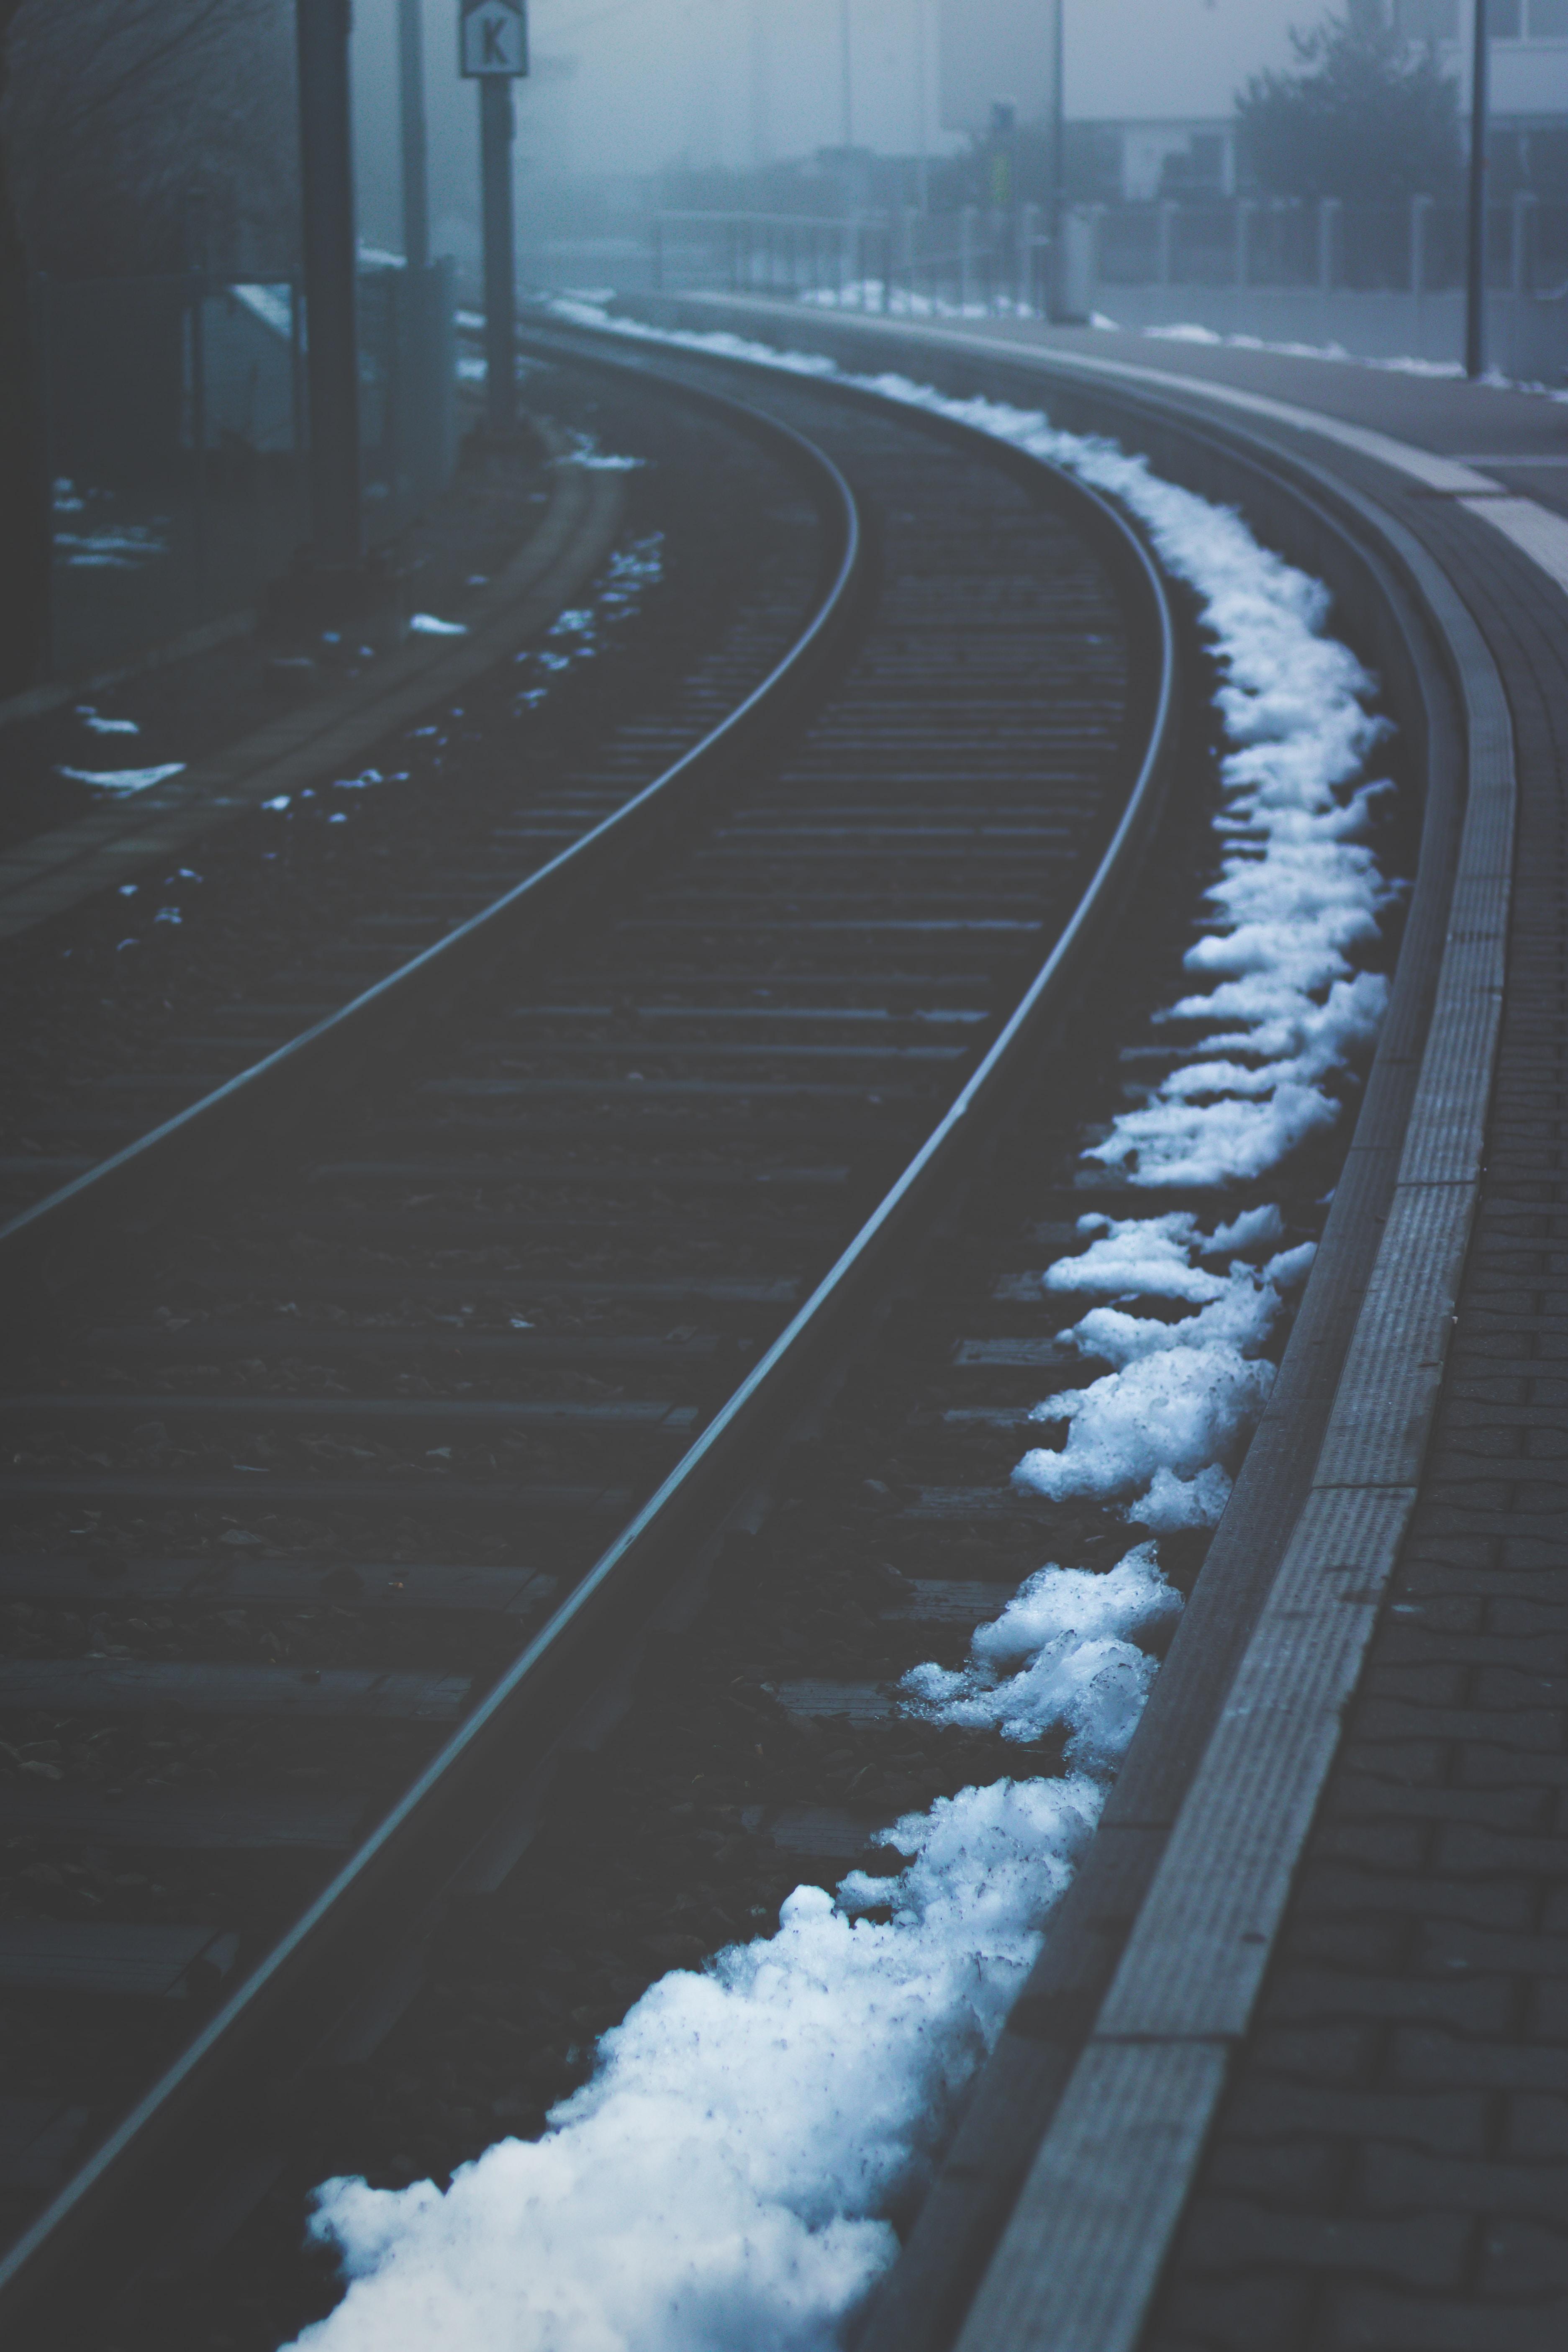 low light photography of train rails under foggy sky